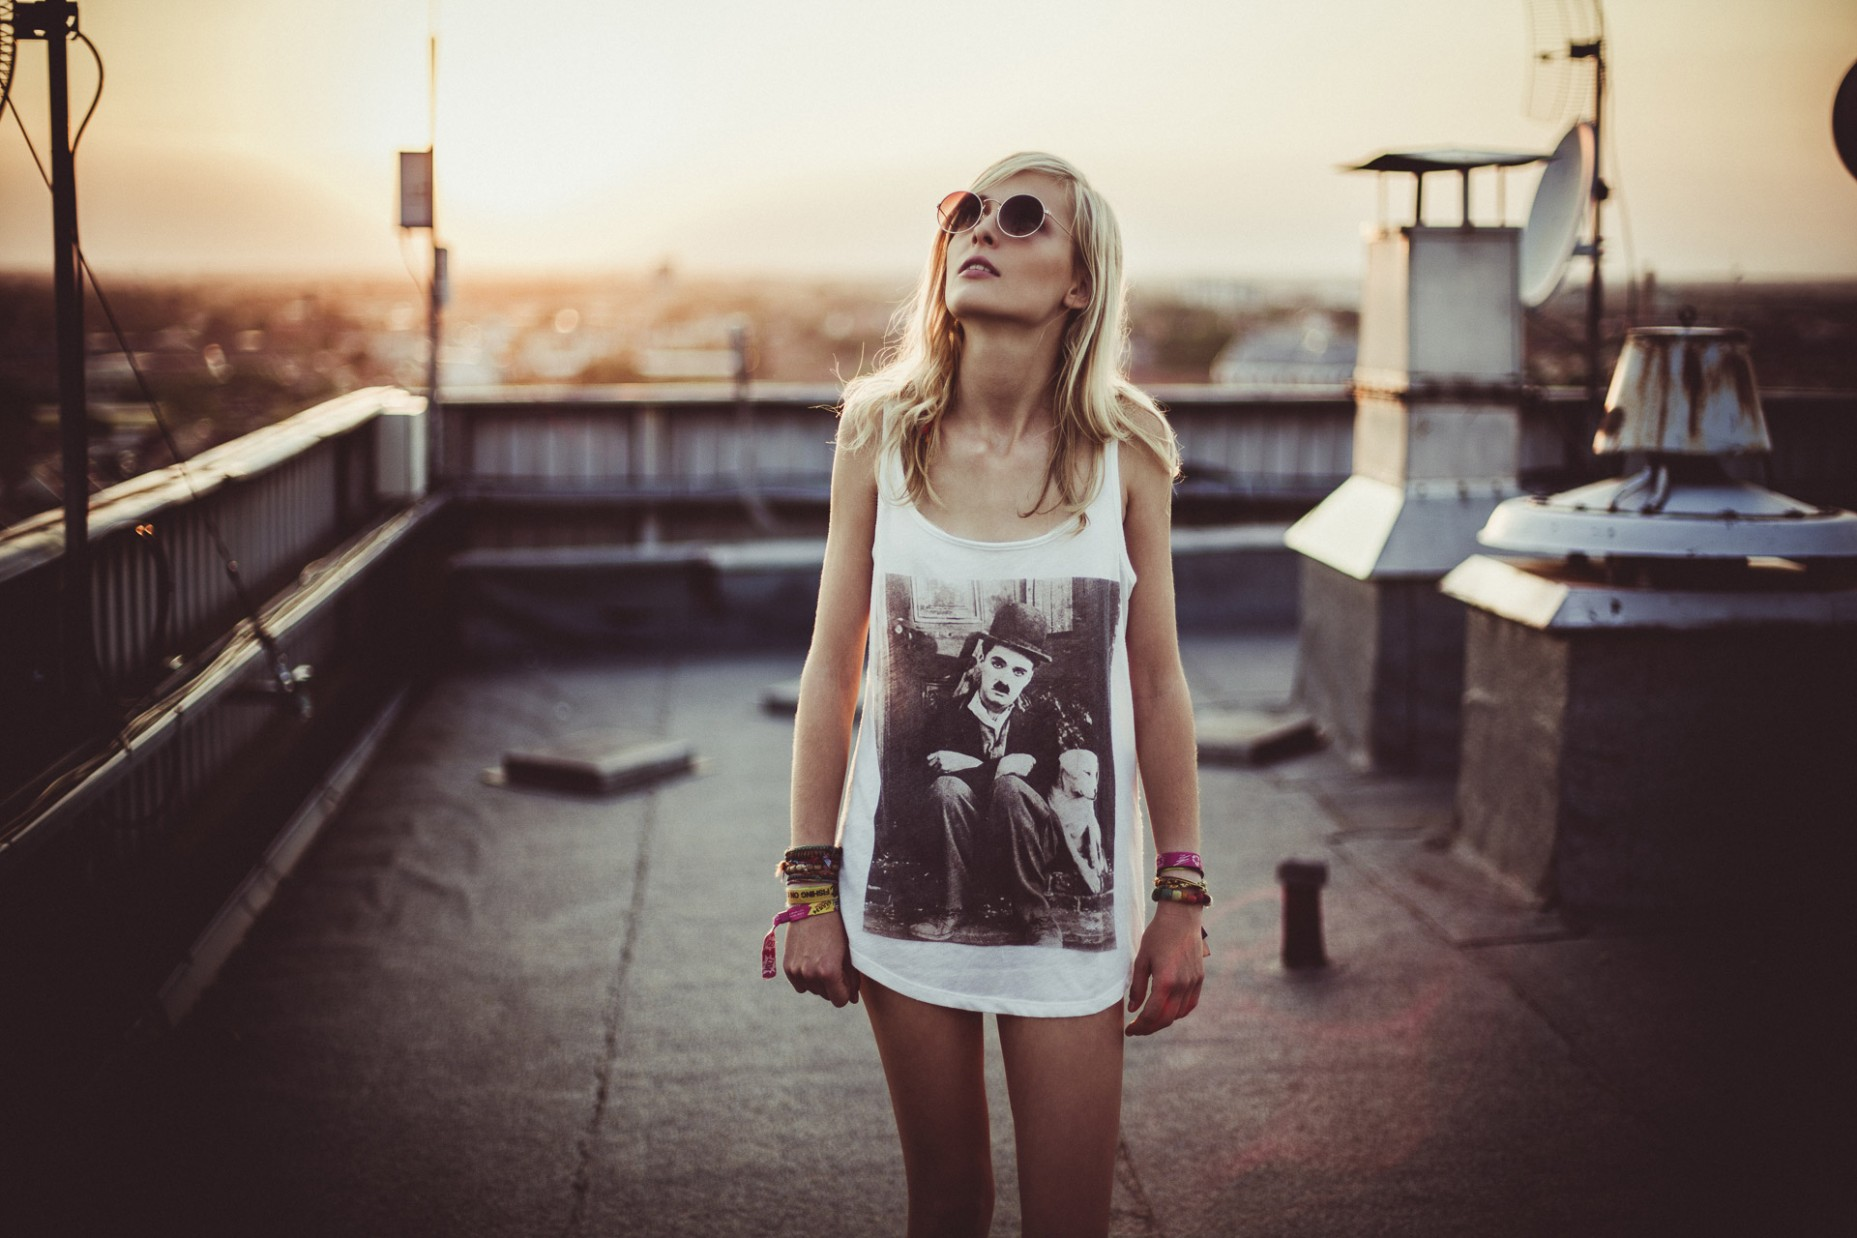 modell_fashion_fotozas_portre_foto_lenart_gabor_sztyui_budapest_IMG_4512